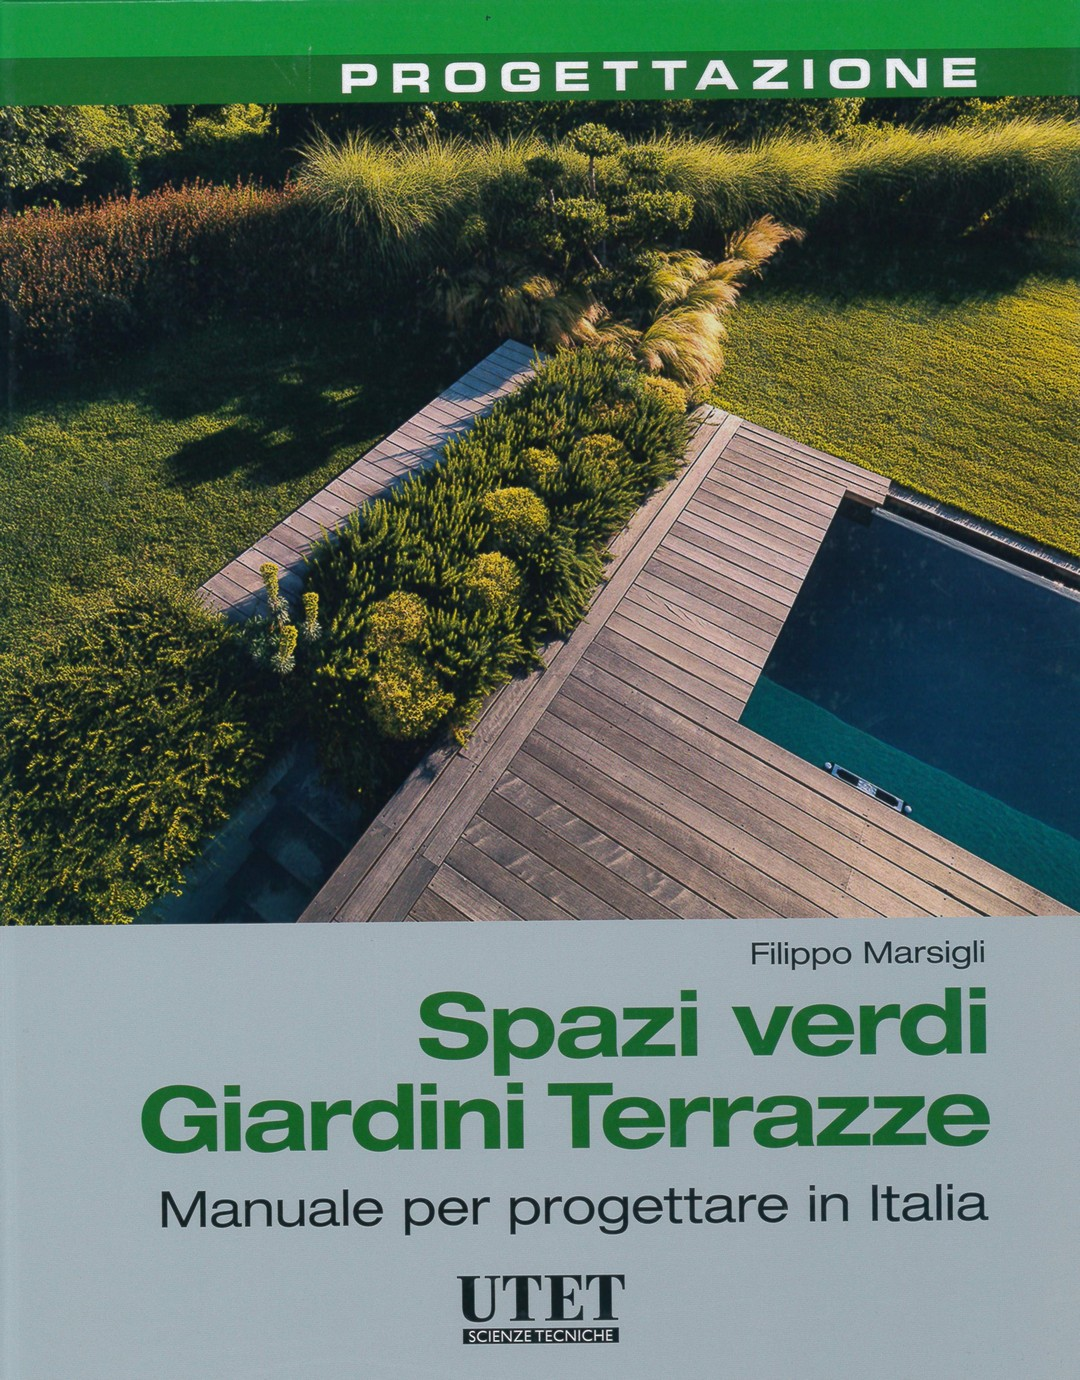 spazi verdi giardini terrazze ag p greenscape